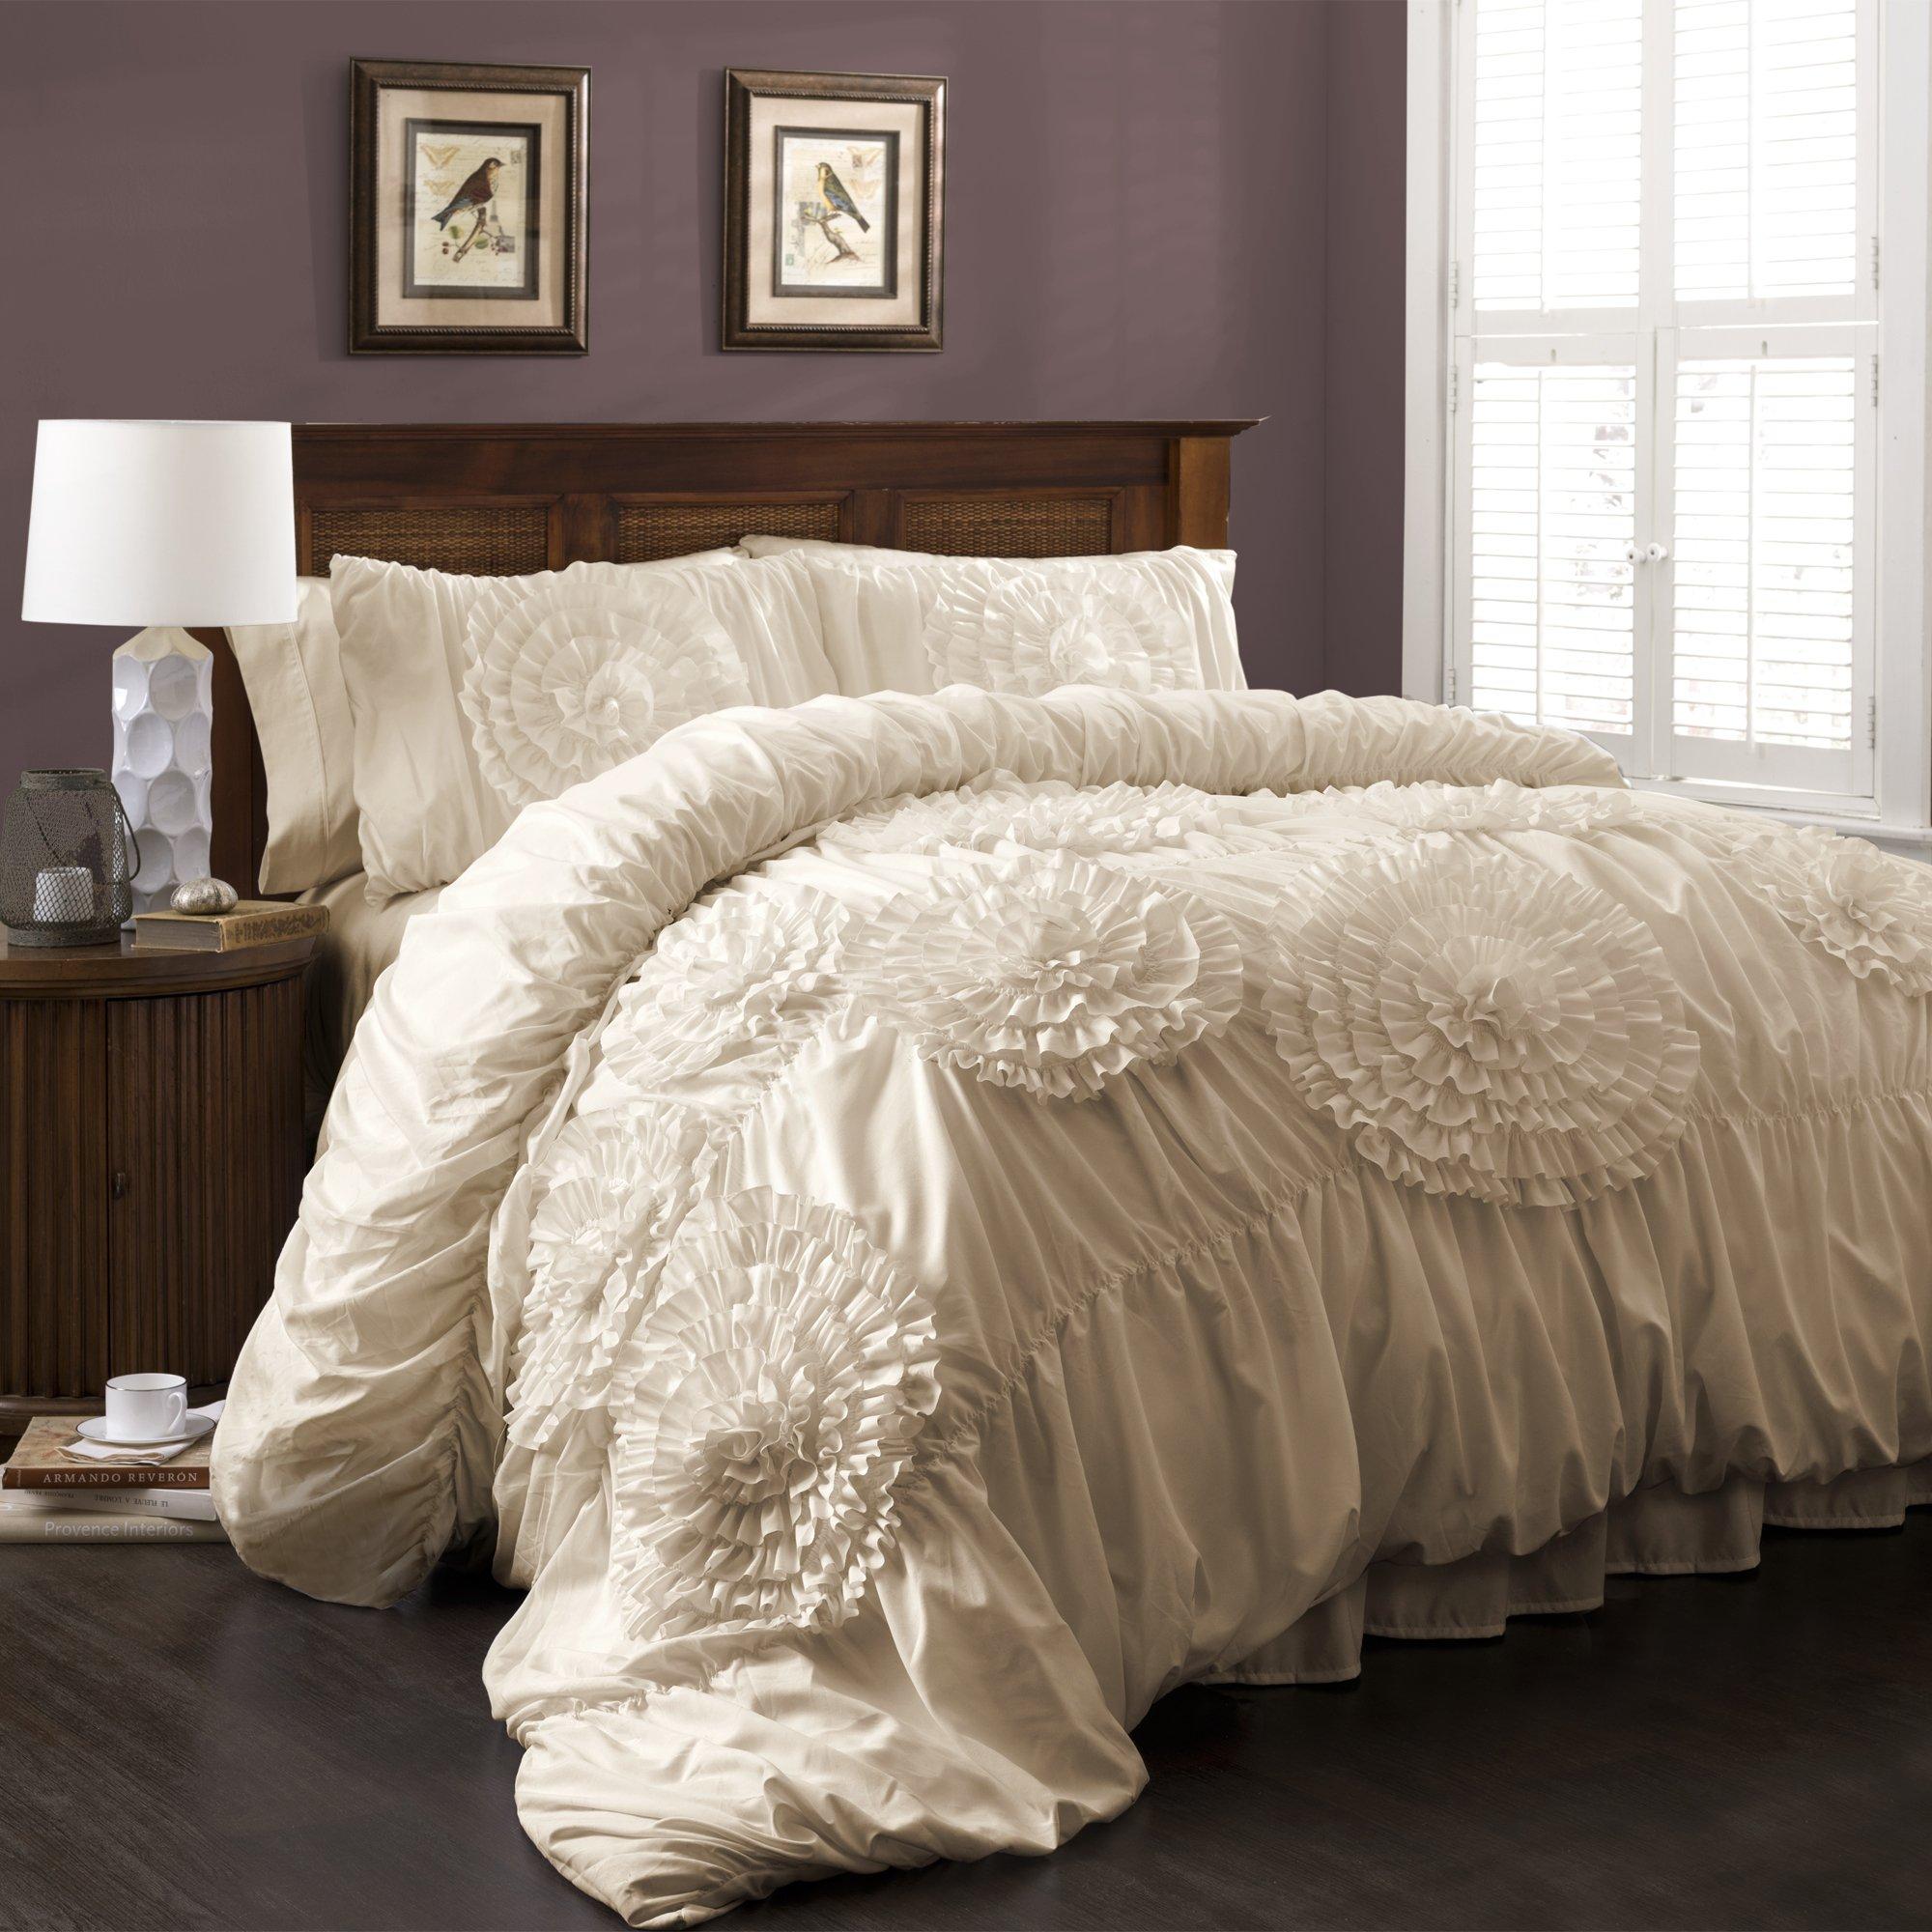 Lush Decor 3 Piece Serena Comforter Set, King, Ivory